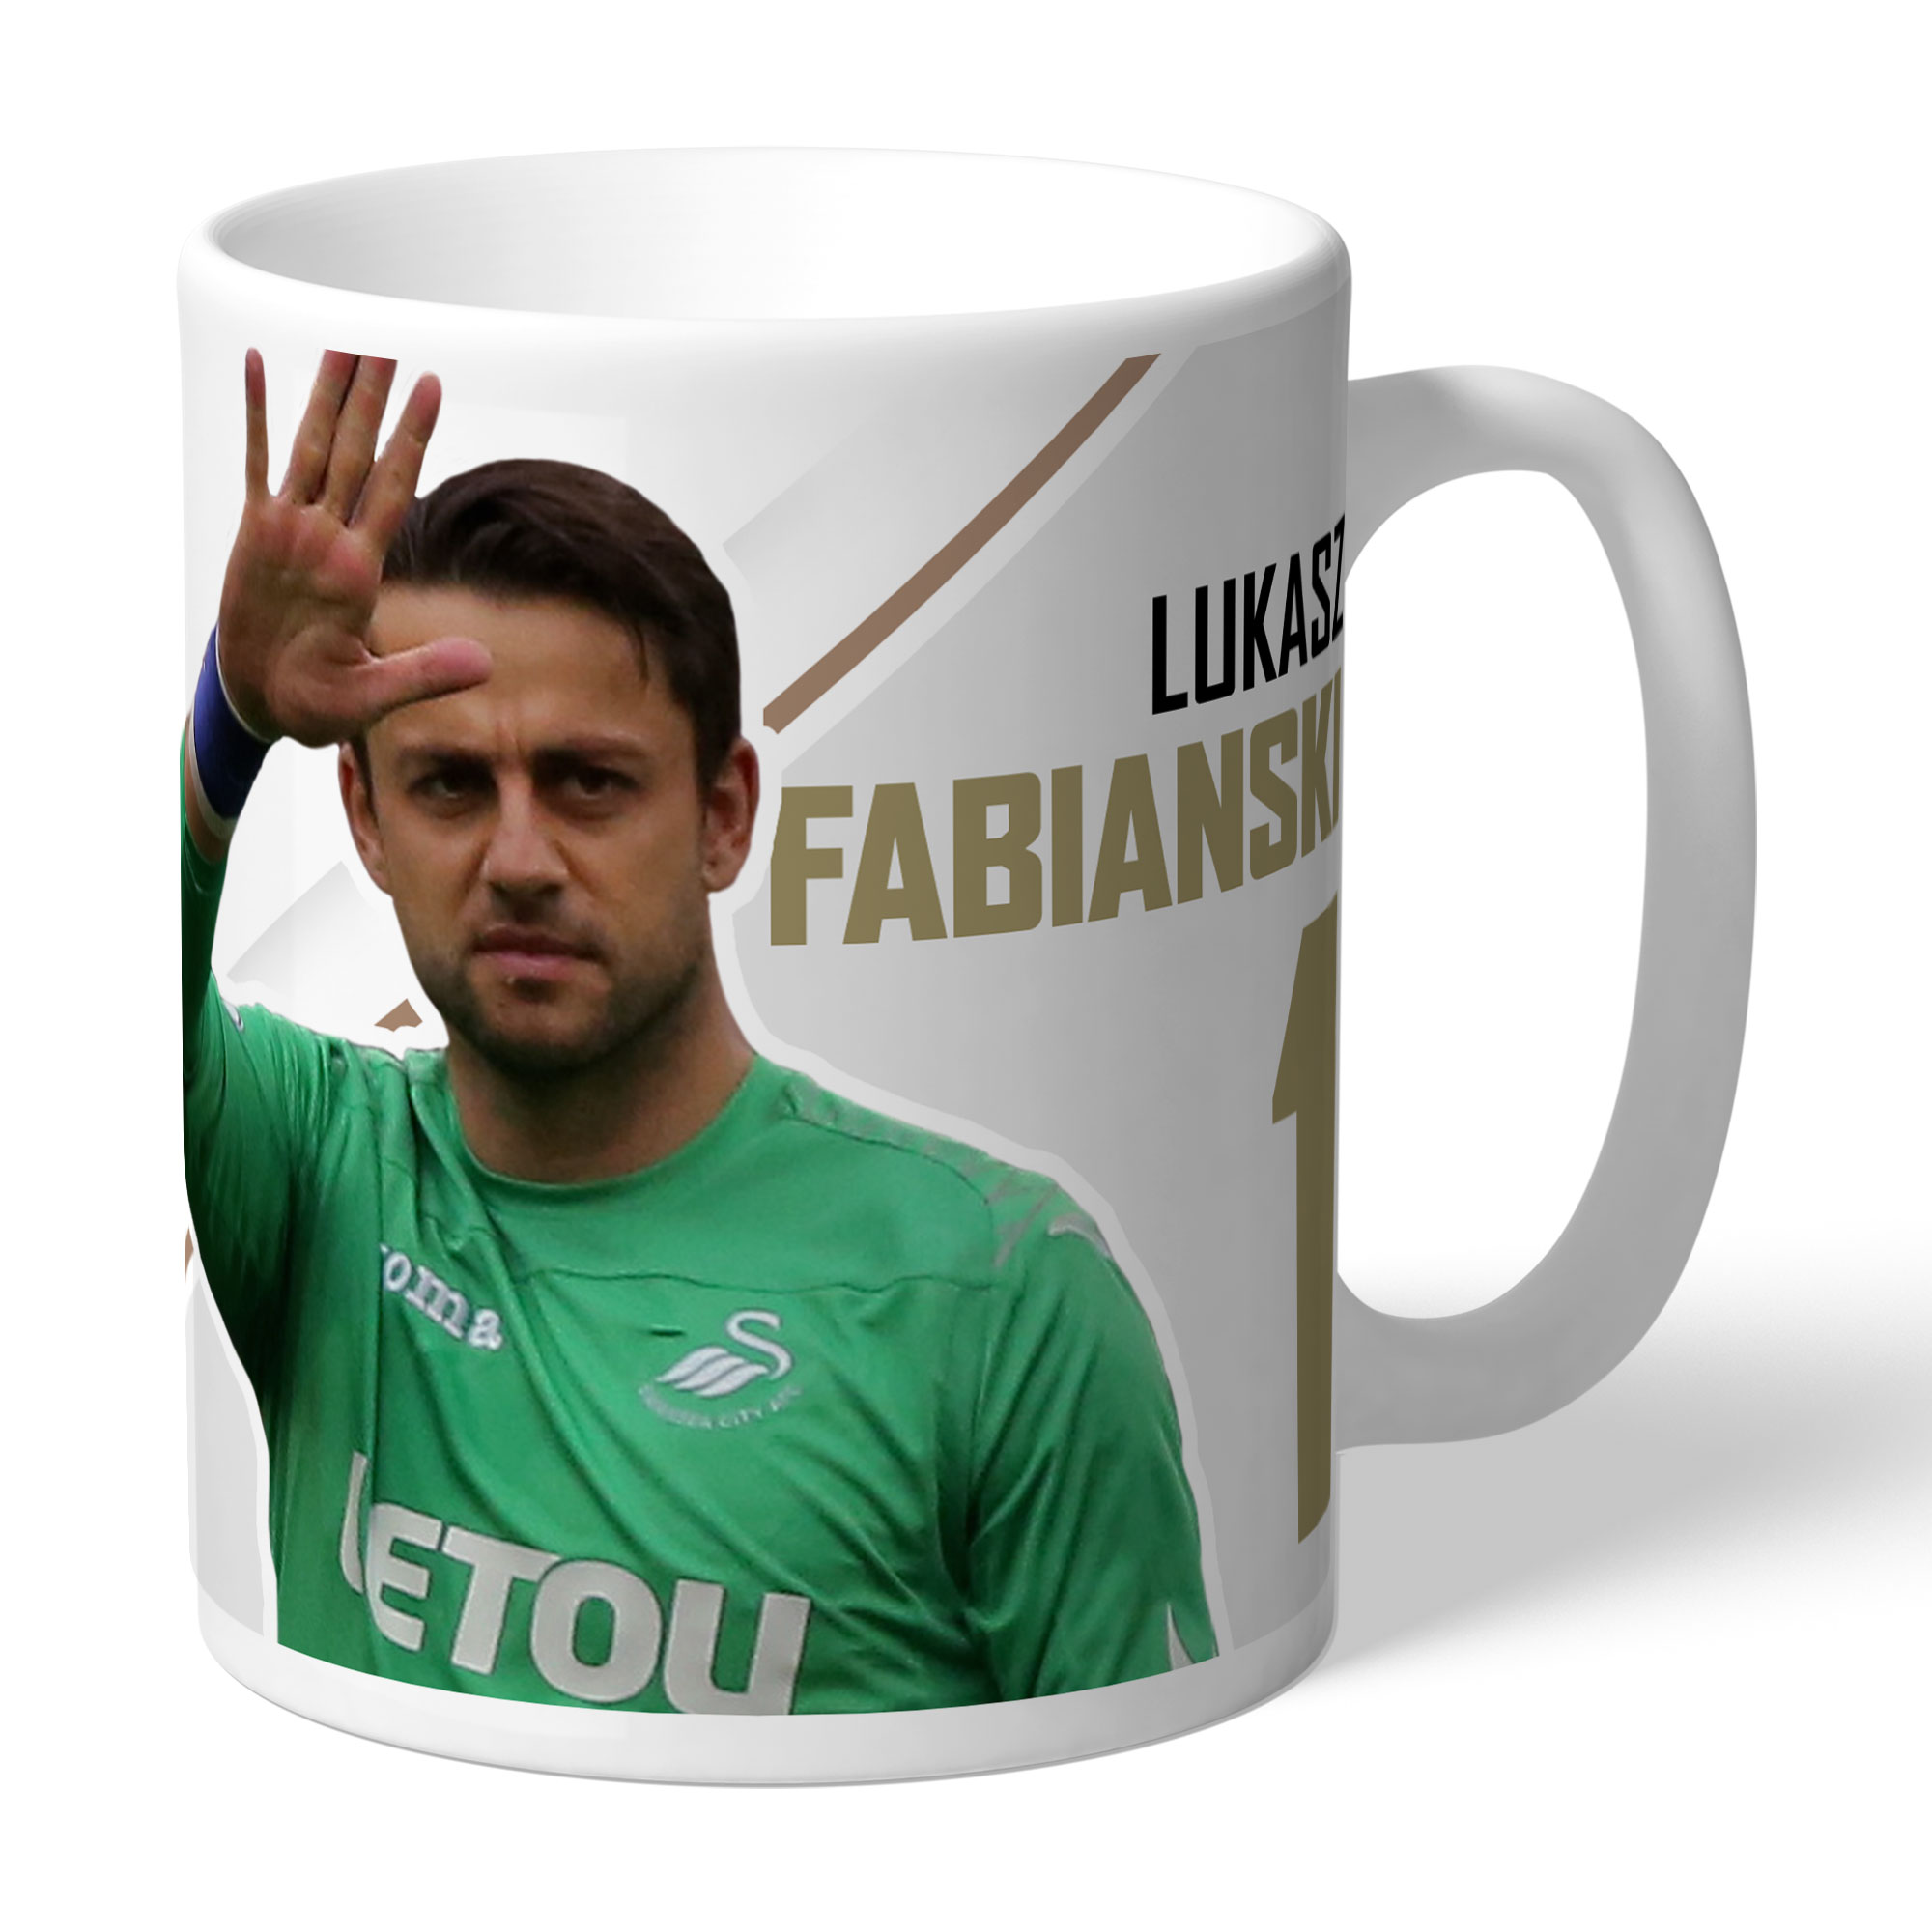 Swansea City AFC Fabianski Autograph Mug